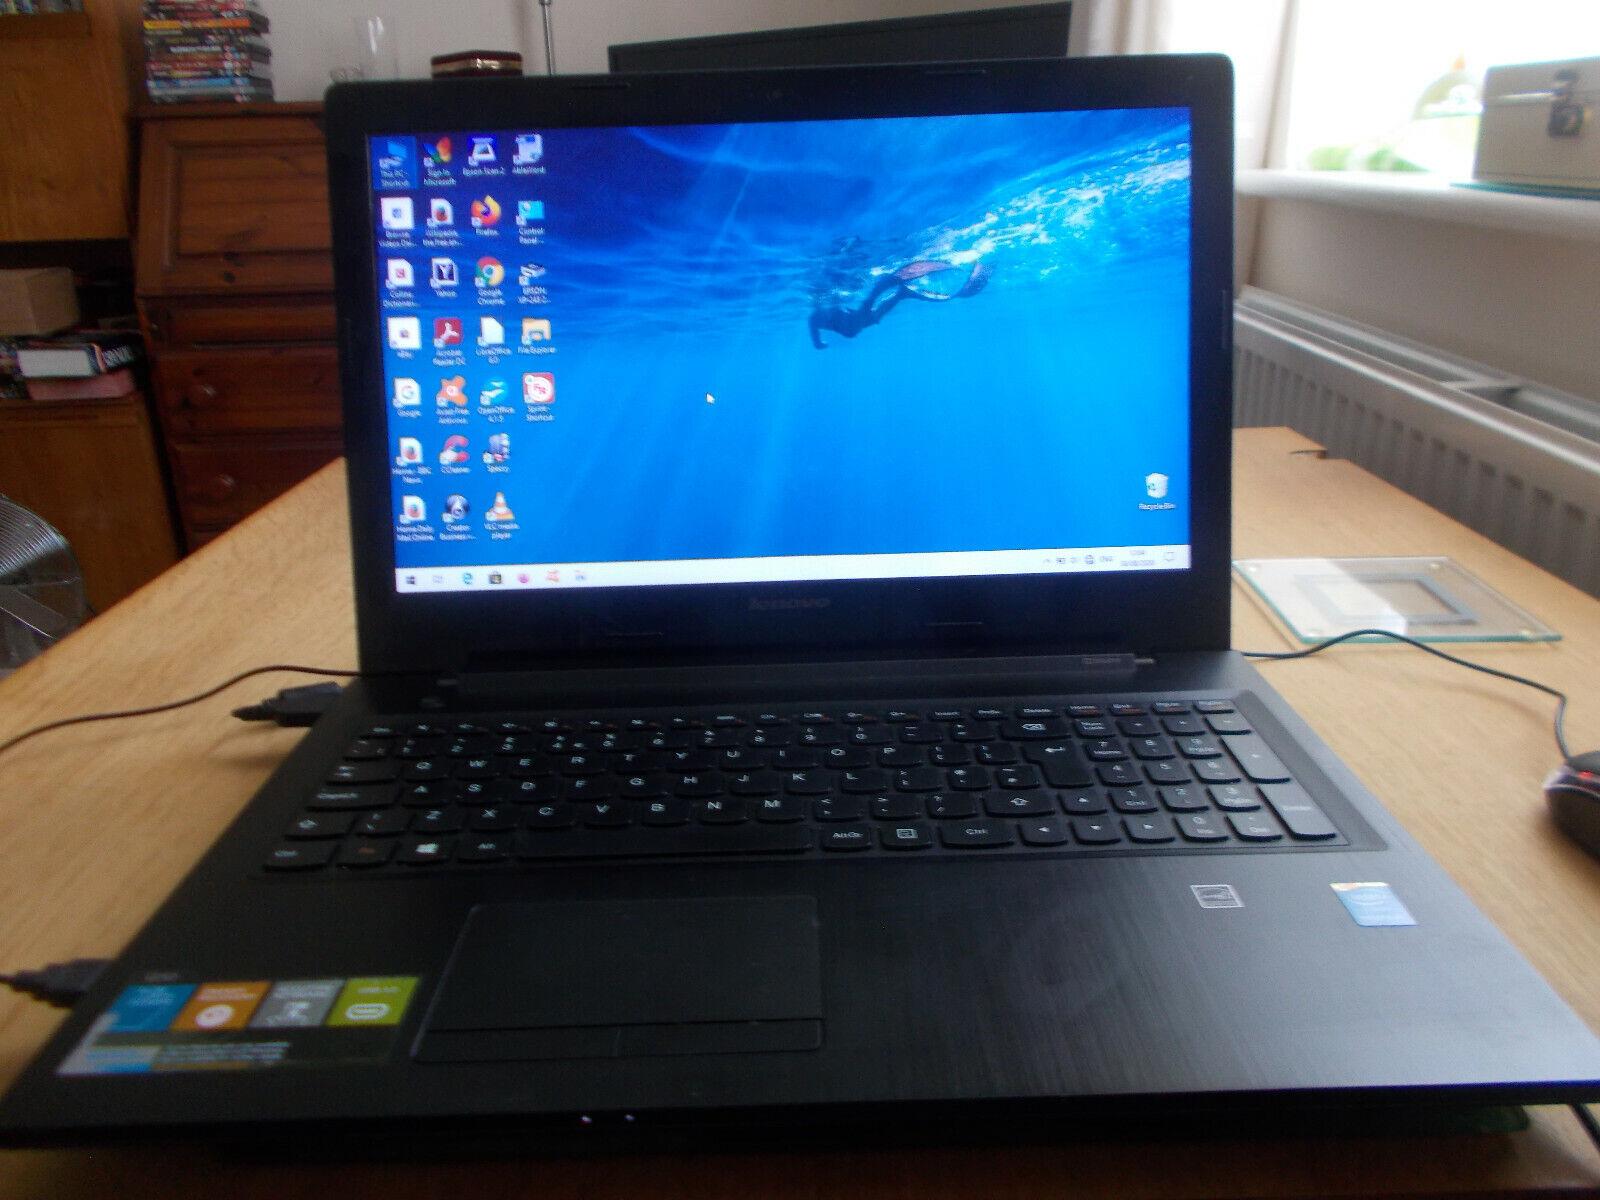 Laptop Windows - Lenovo G50 WiFi Laptop, Windows 10, Intel Pentium 2.16 GHz, 4GB RAM